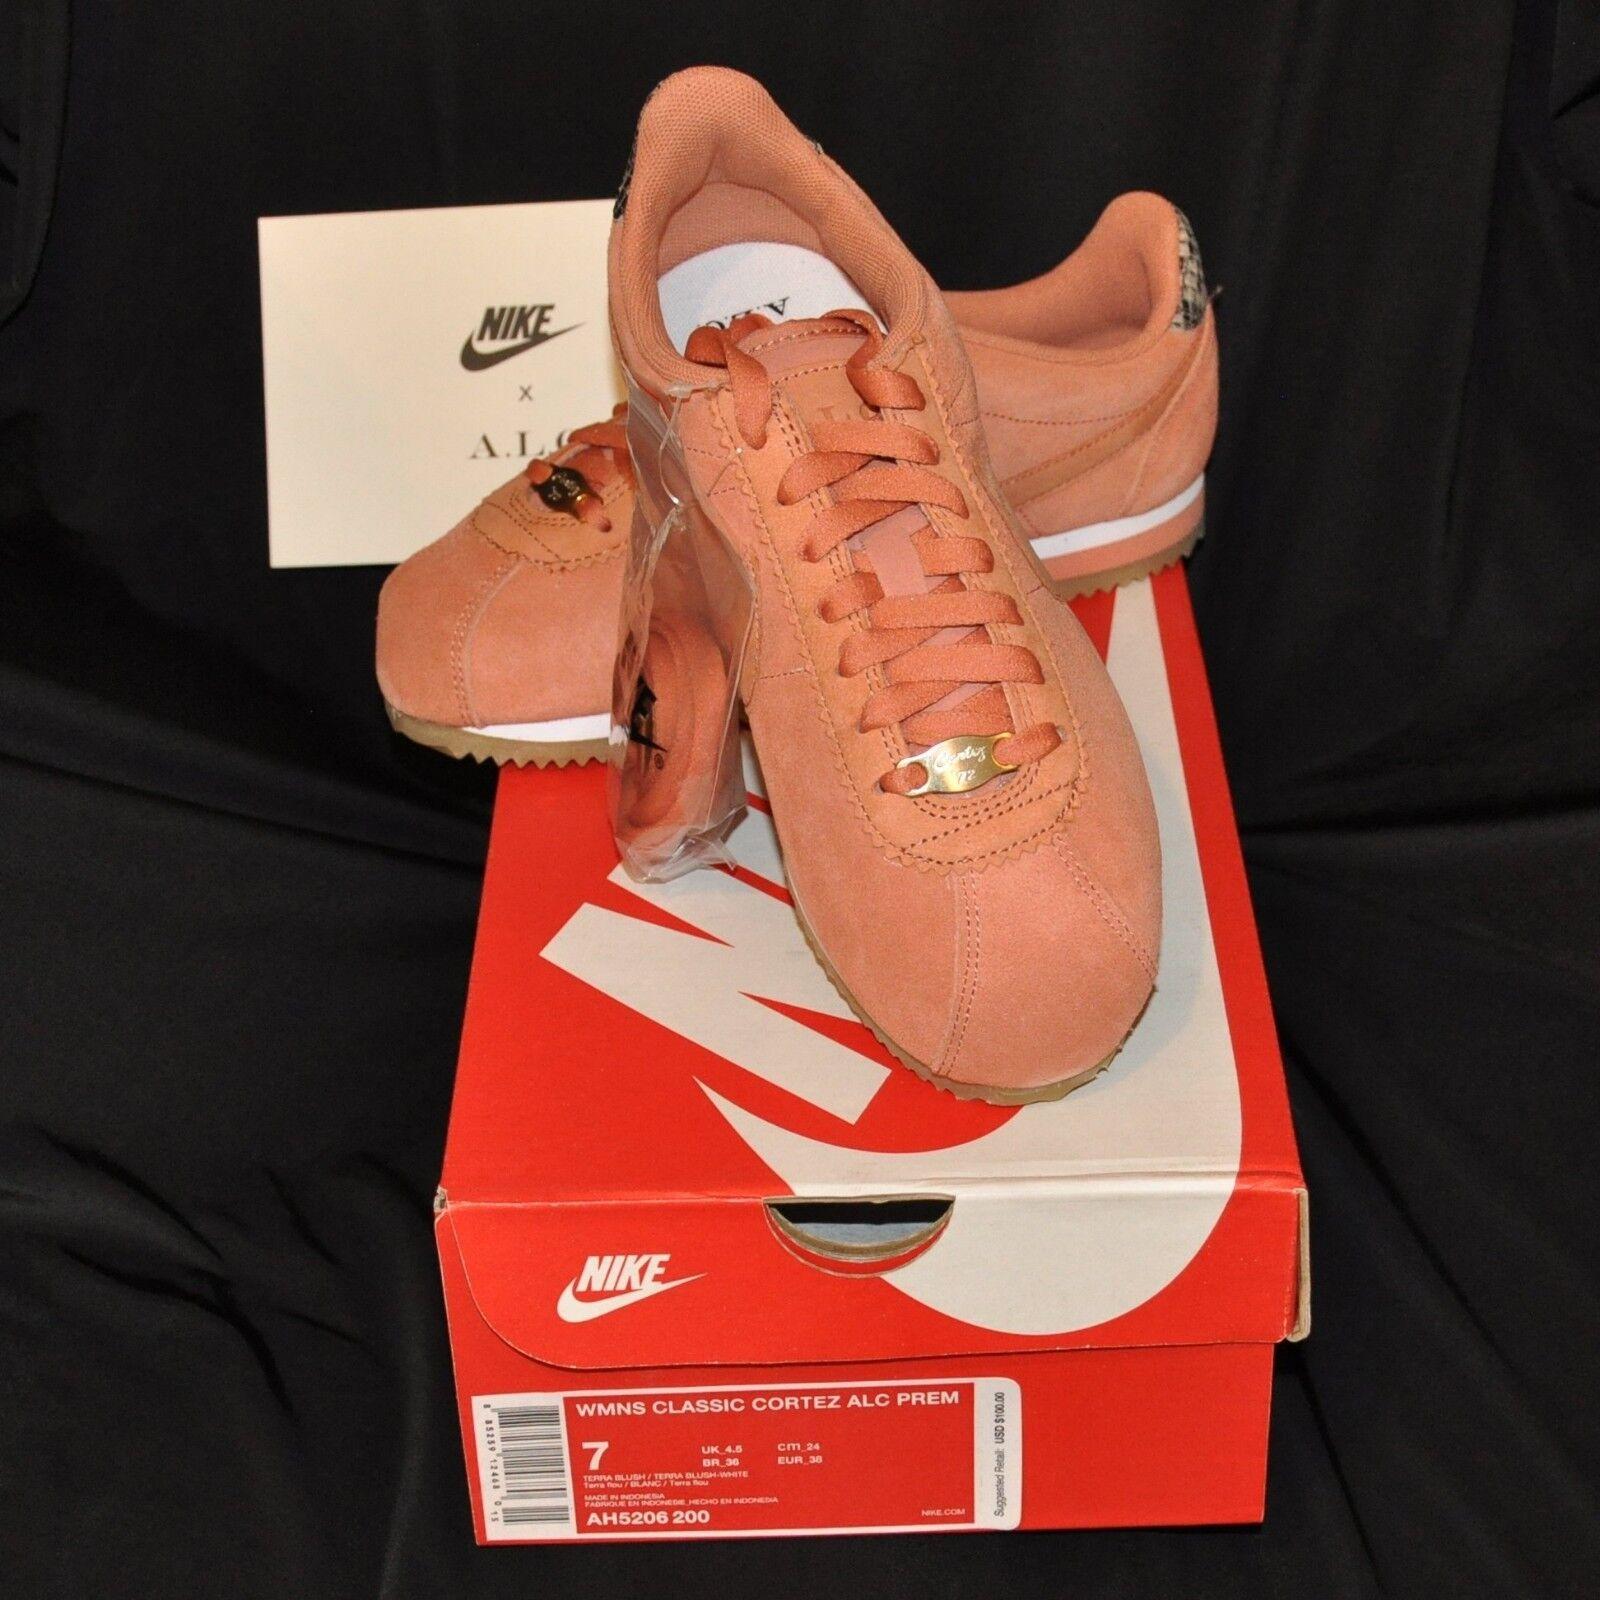 Nike Donna 7 Cortex Classic Premium Size Terra Blush Nib 5H0Eqn6xfw